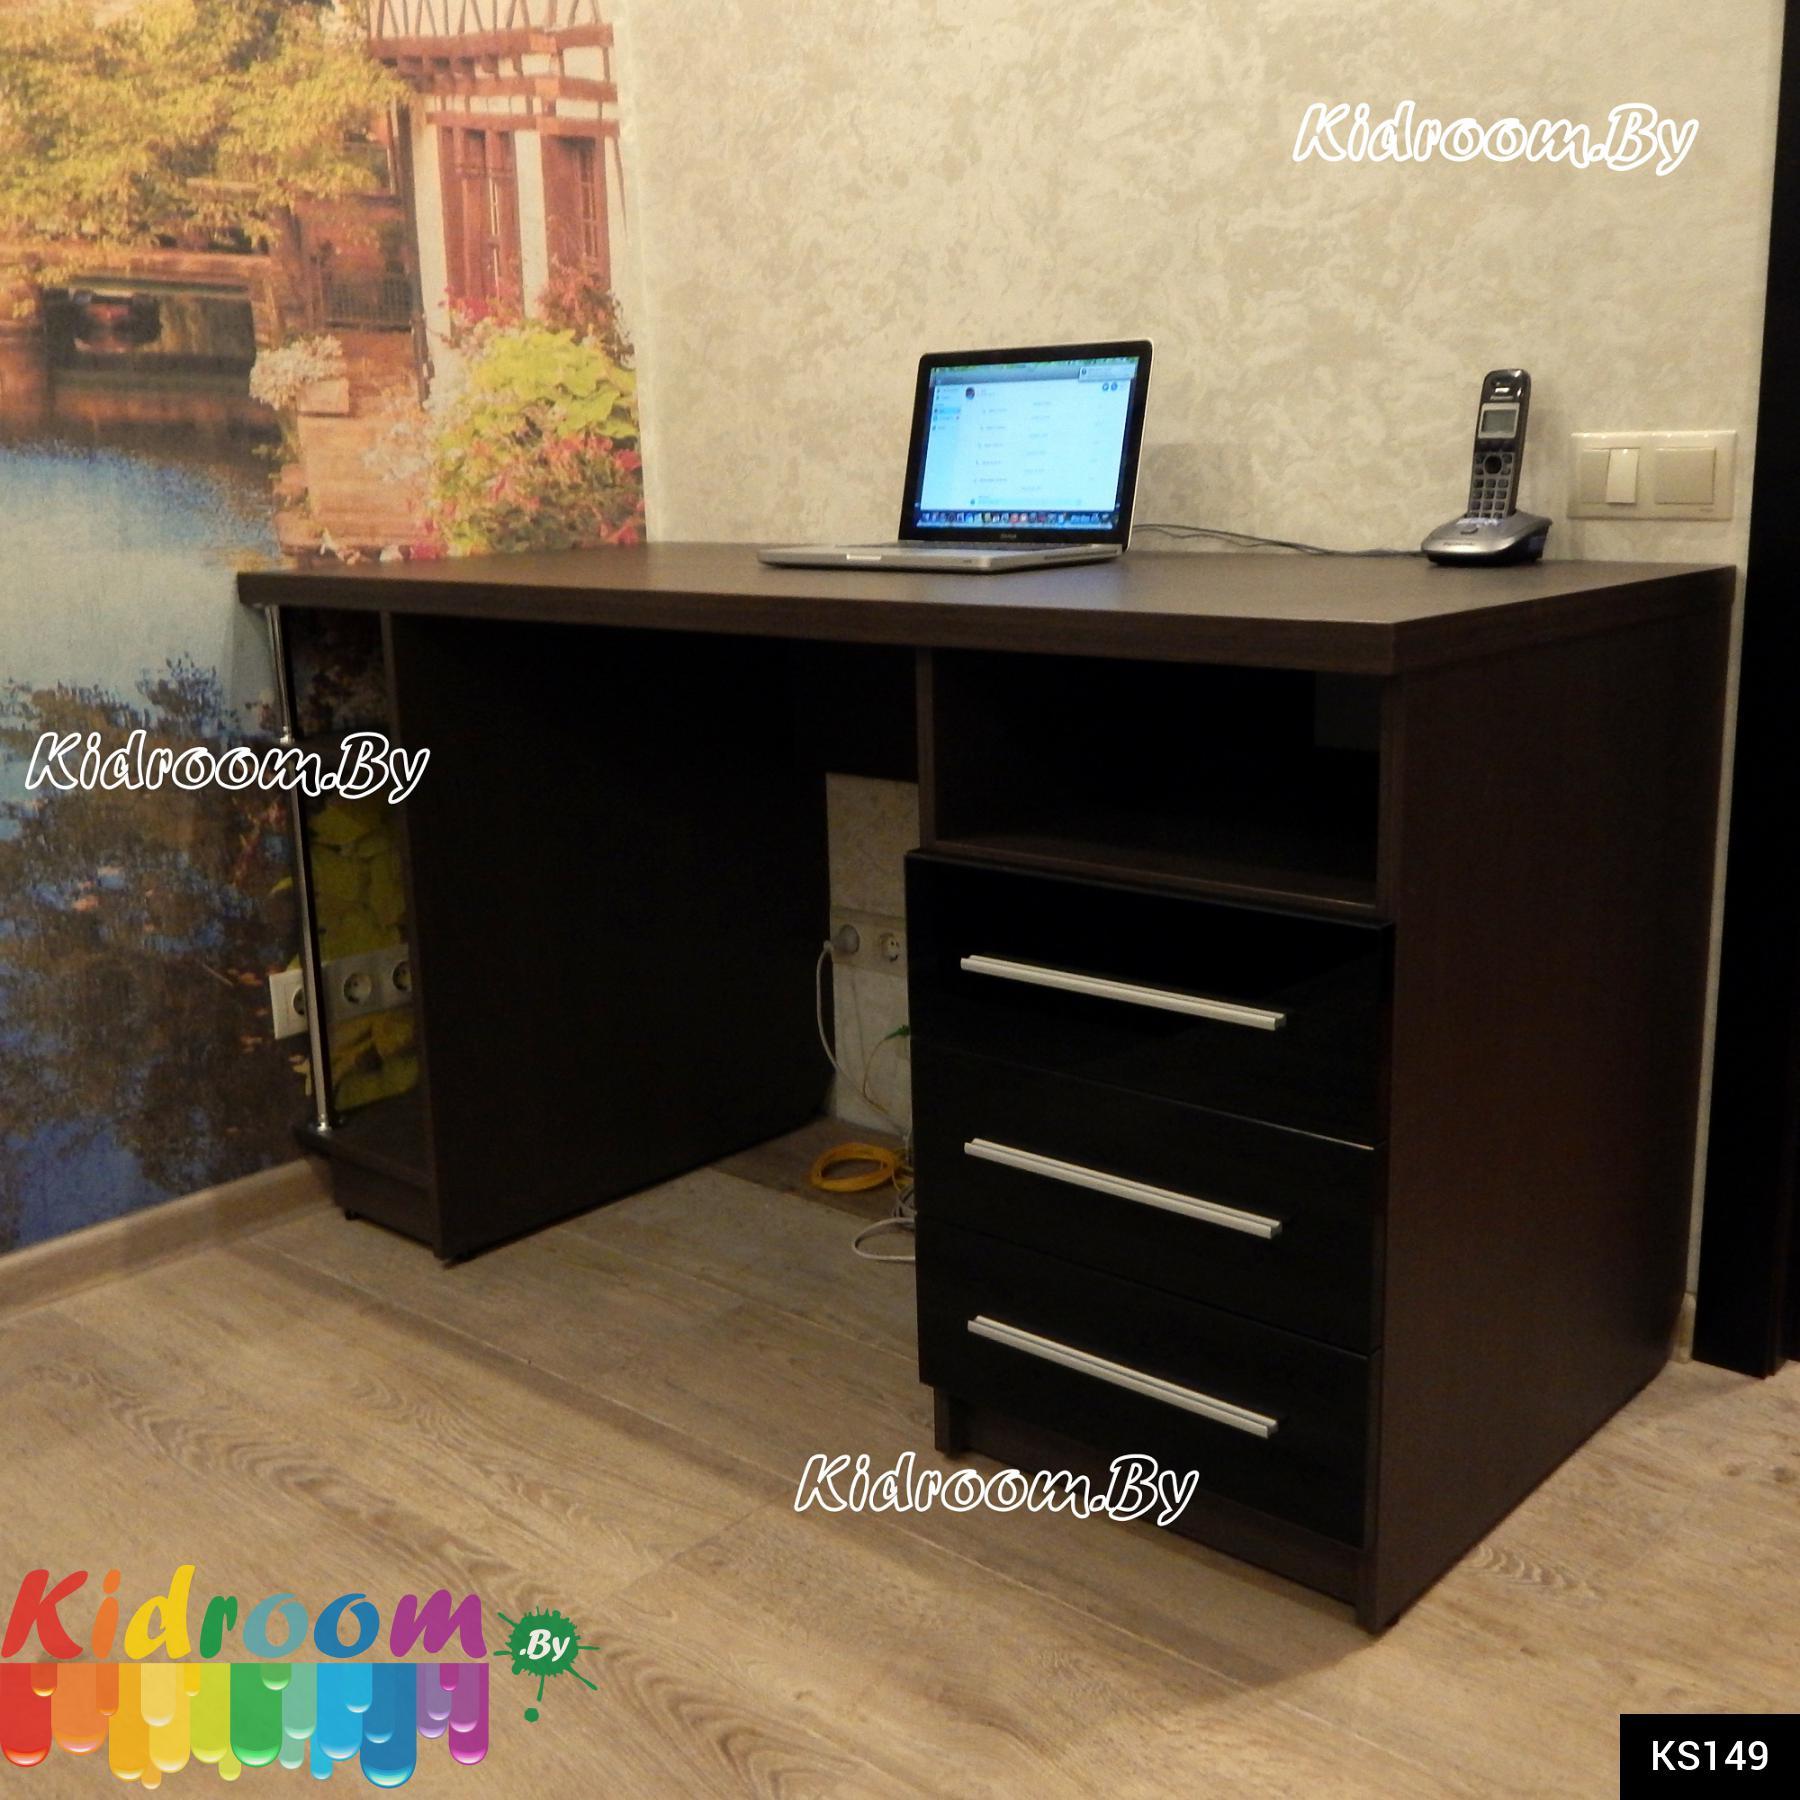 Doska.by столы - письменные мебельный салон тц ''камелот'' у.